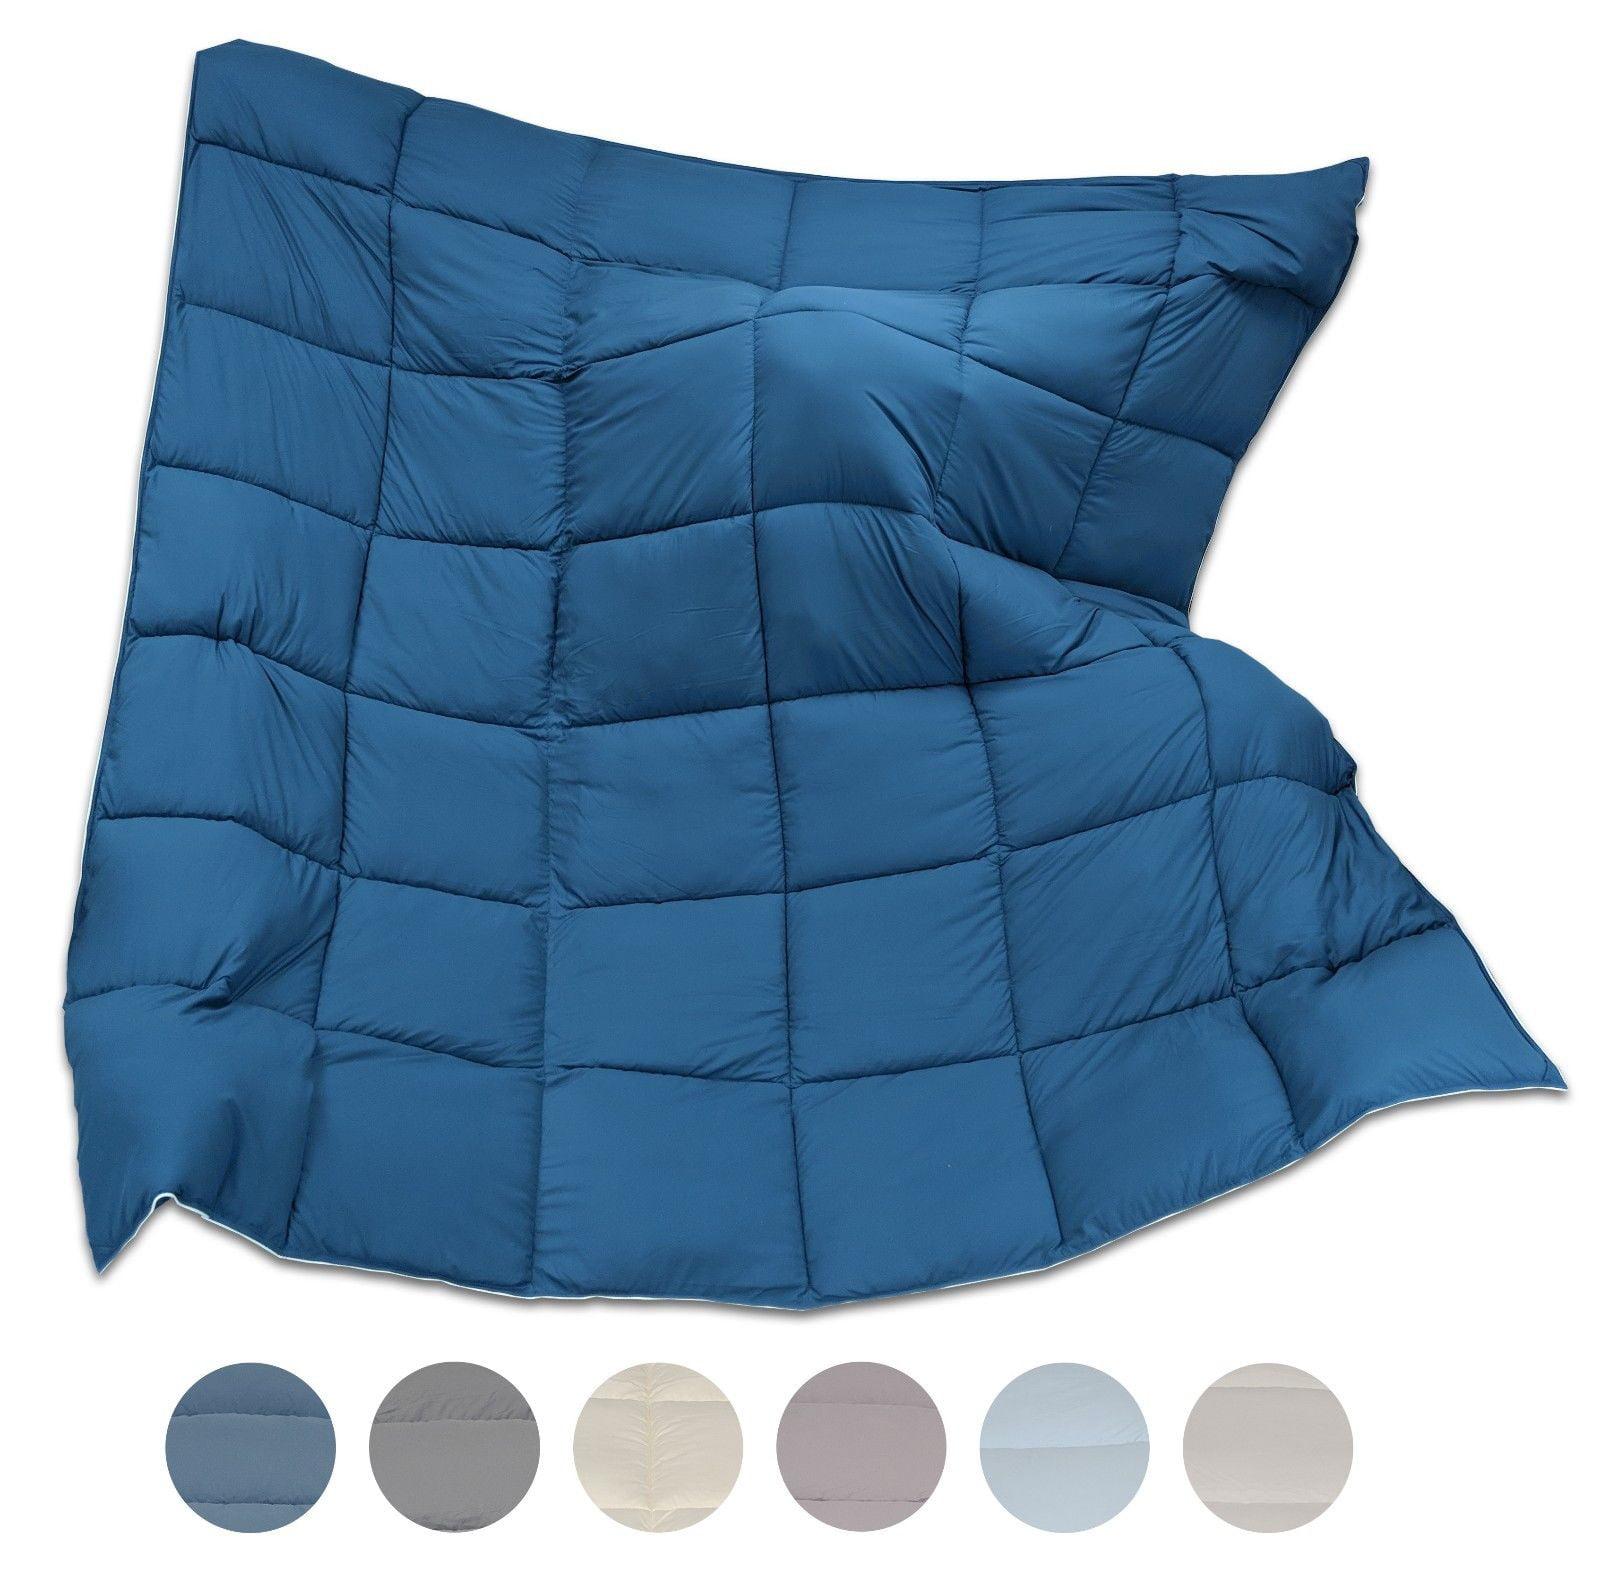 Pillowtex Dream in Color All Season Comforter (Full/Queen, Cream)